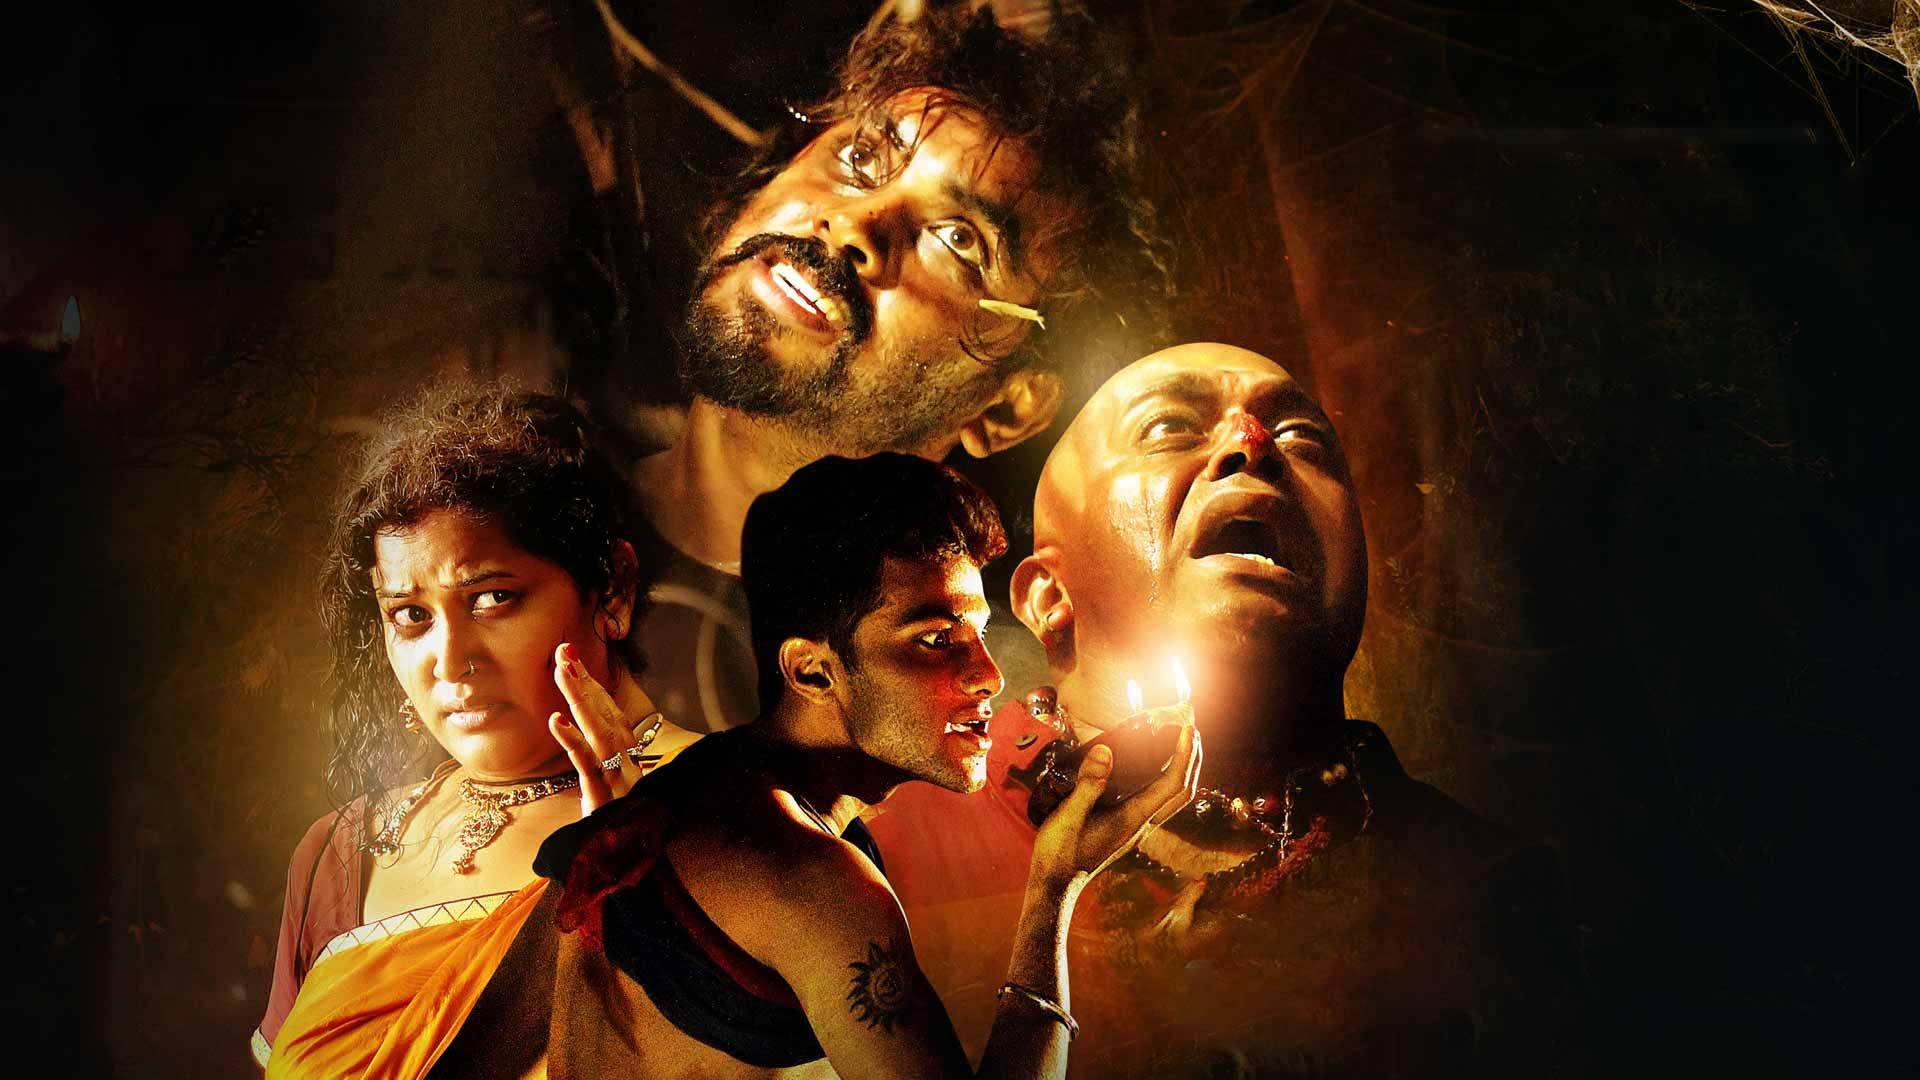 Anando Brahma Full Movie Online Watch Anando Brahma in Full HD Quality